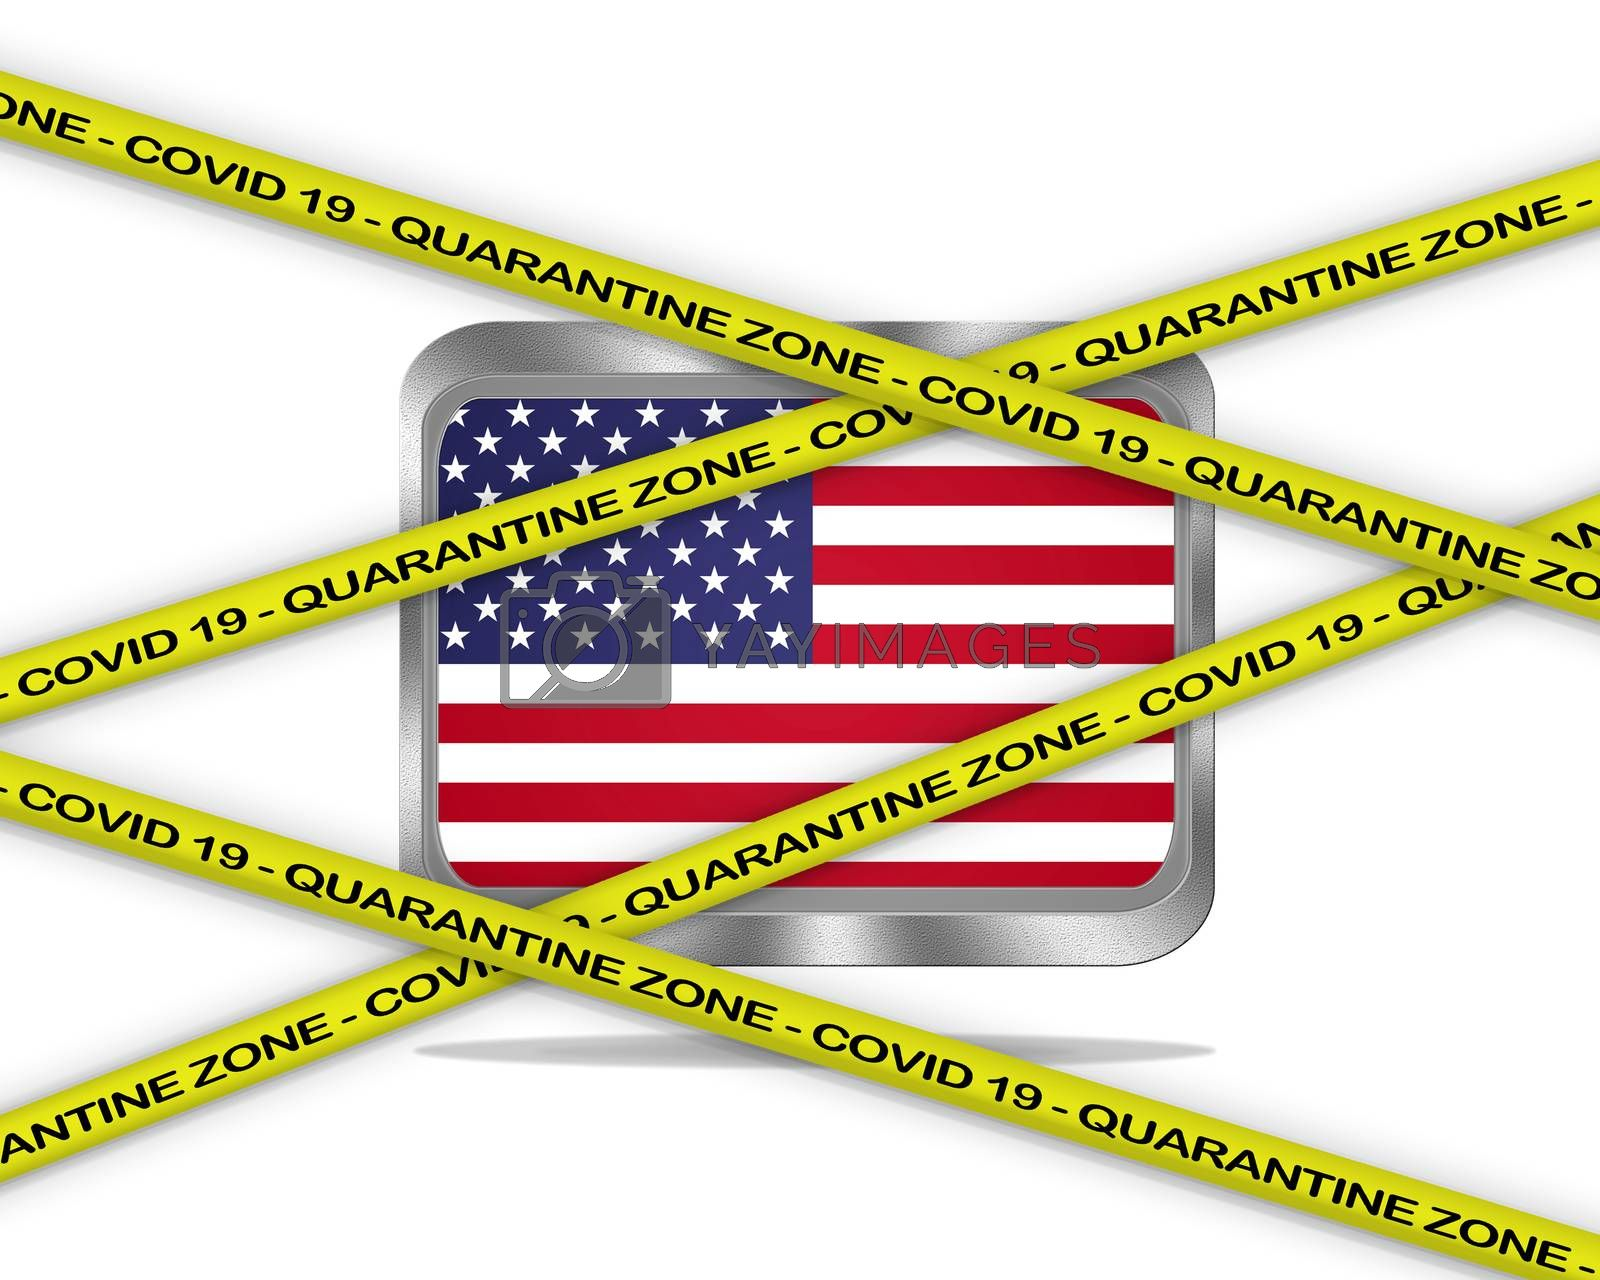 COVID-19 warning yellow ribbon written with: Quarantine zone Cover 19 on Usa flag illustration. Coronavirus danger area, quarantined country.